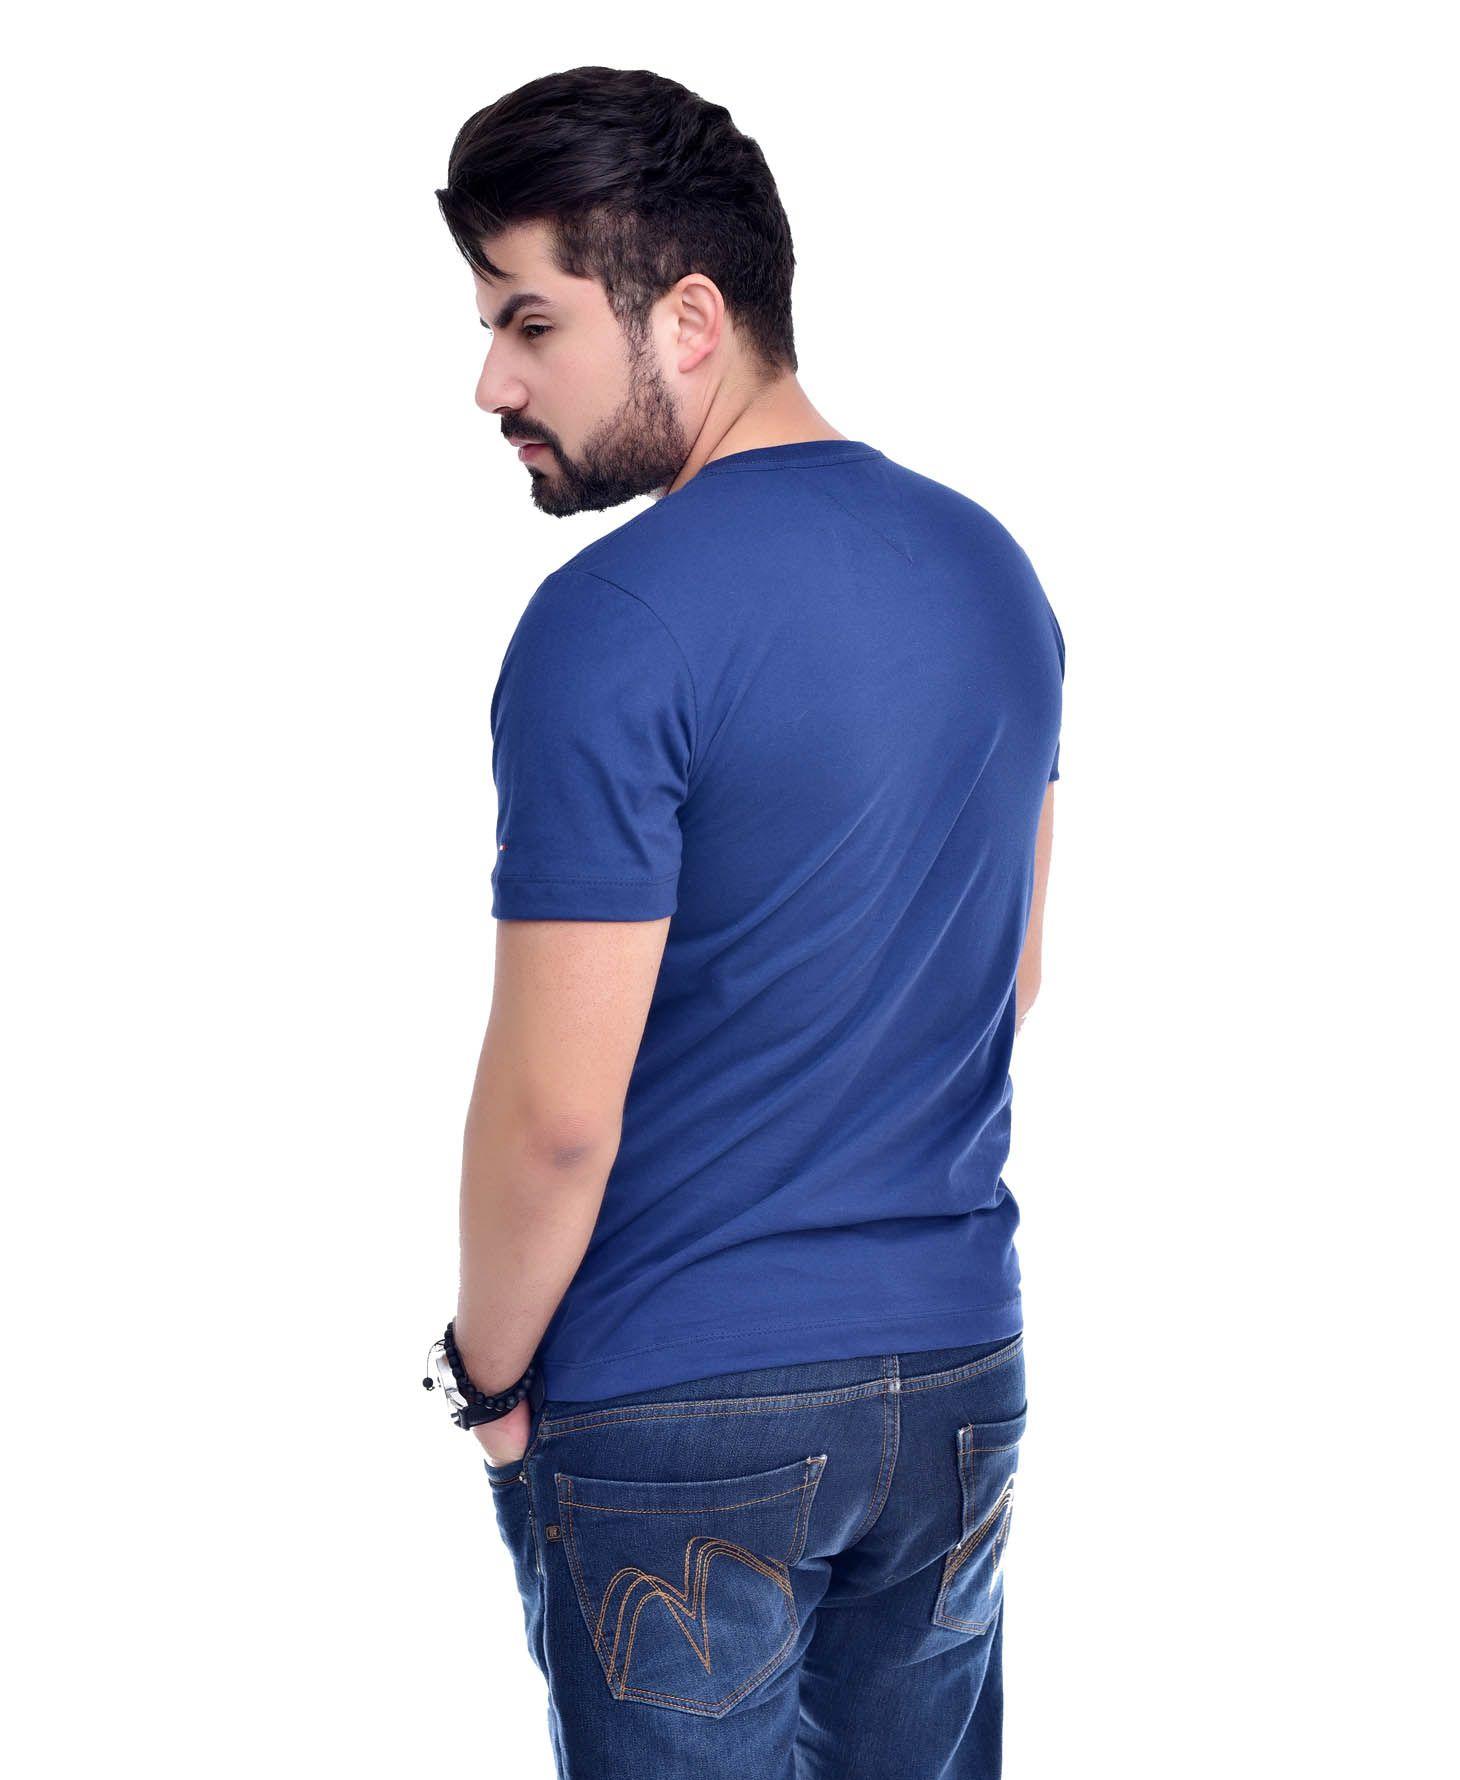 Camiseta Bolso TH Azul Marinho/MC  - Ca Brasileira